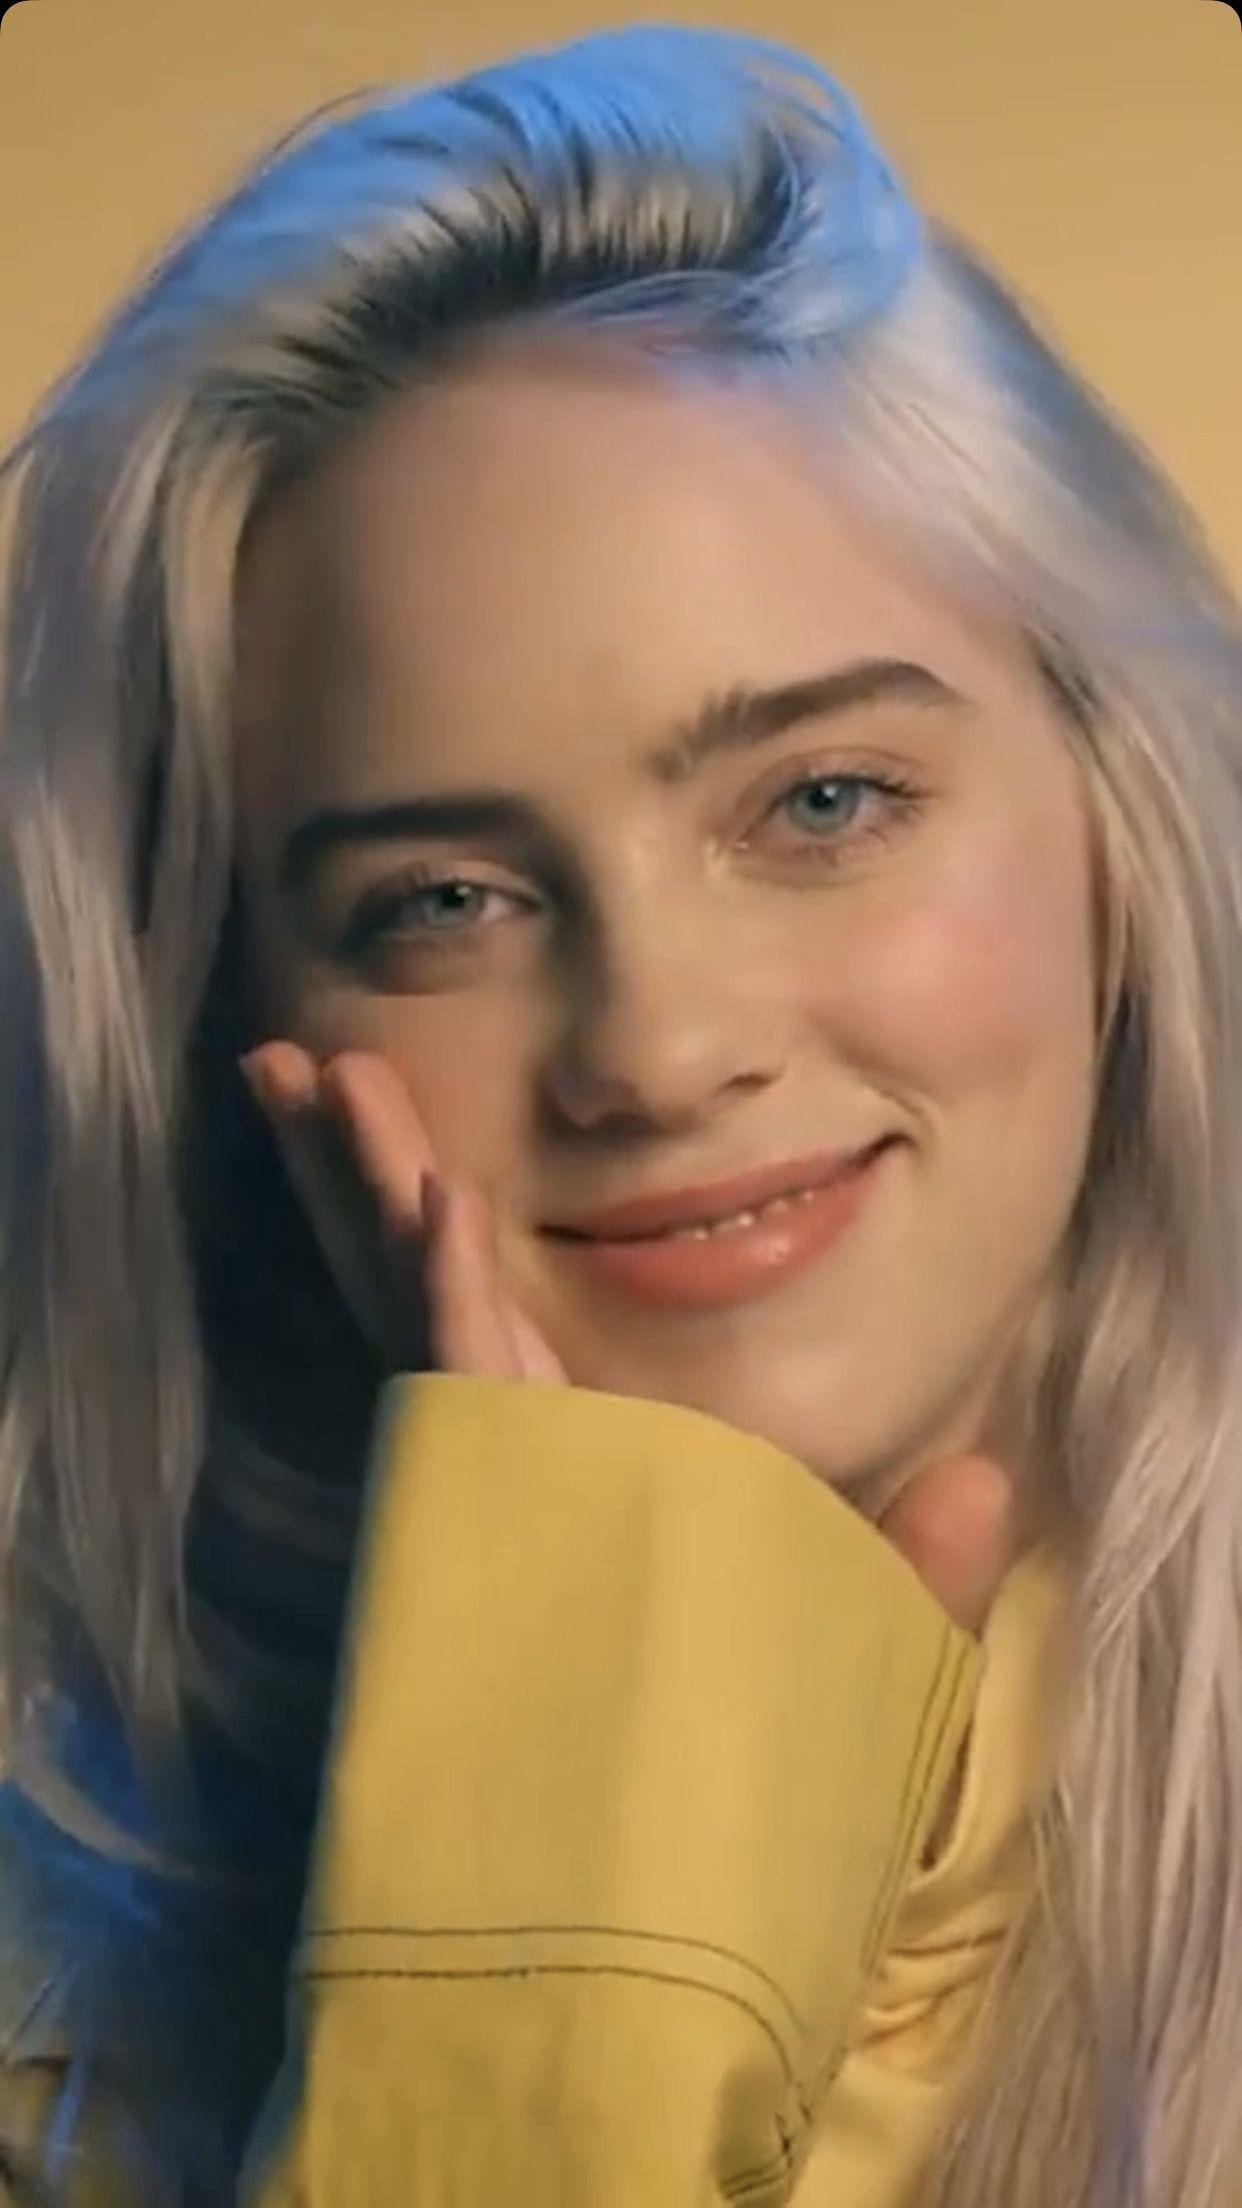 Pictures Of Billie Eilish Smiling Inspirational Pin By H Lec2a5 On My Gf Billie Billie Eilish Singer